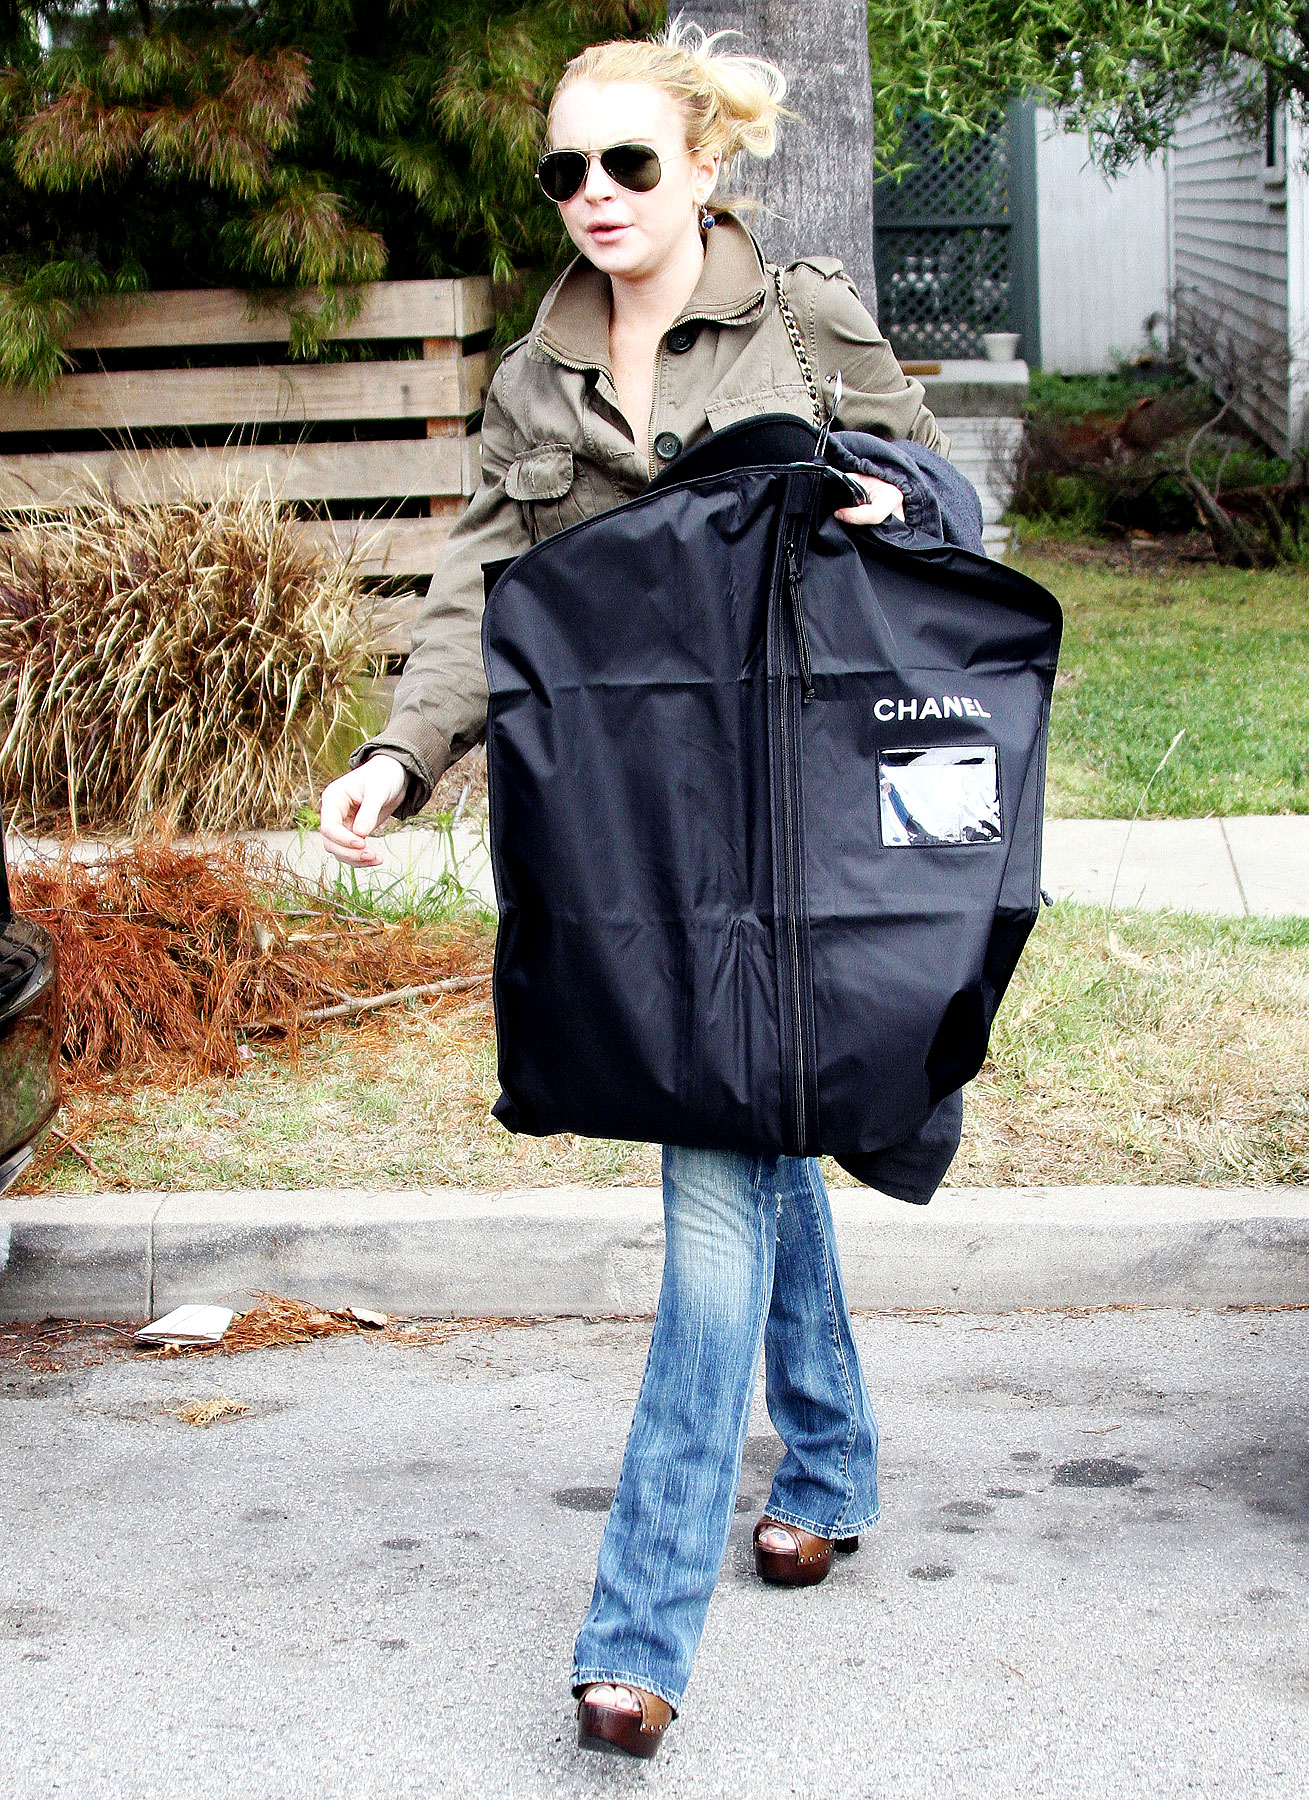 Lindsay Lohan Is a Chanel Bag Lady (PHOTOS)